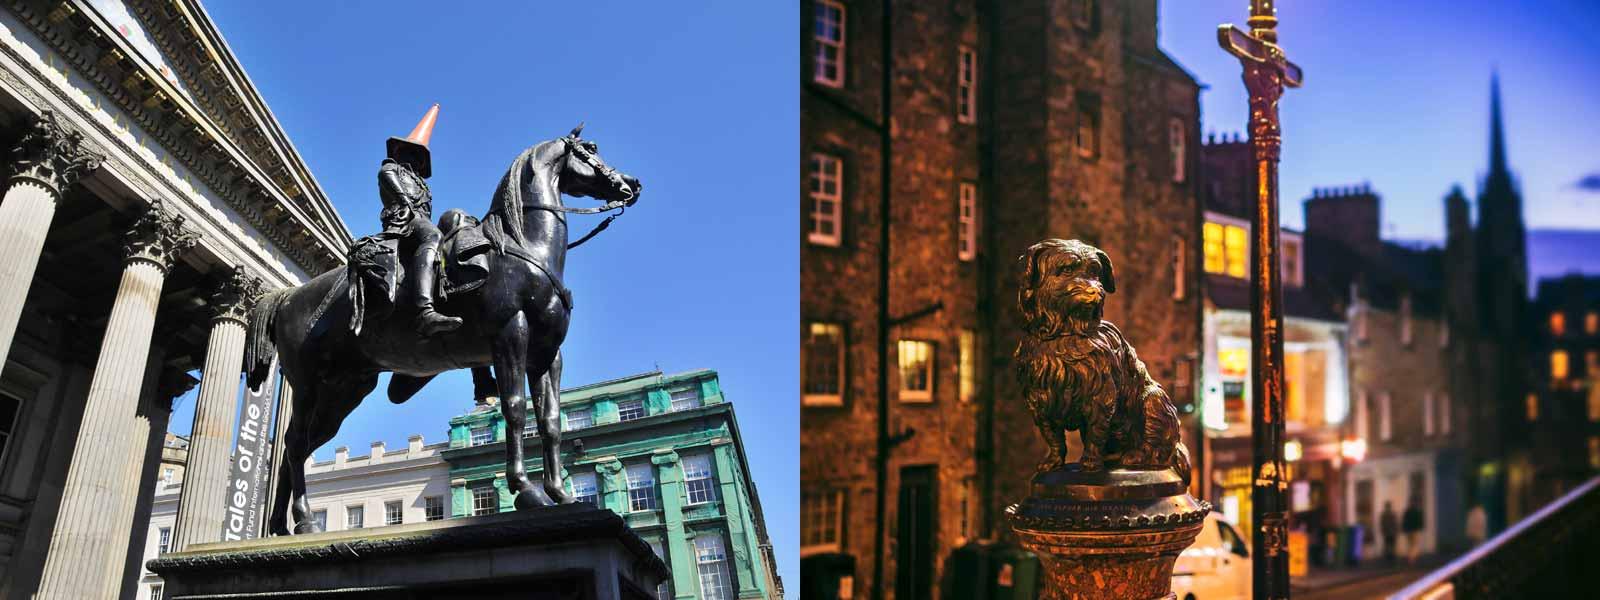 Duke of Wellington and Greyfriars Bobby Statues